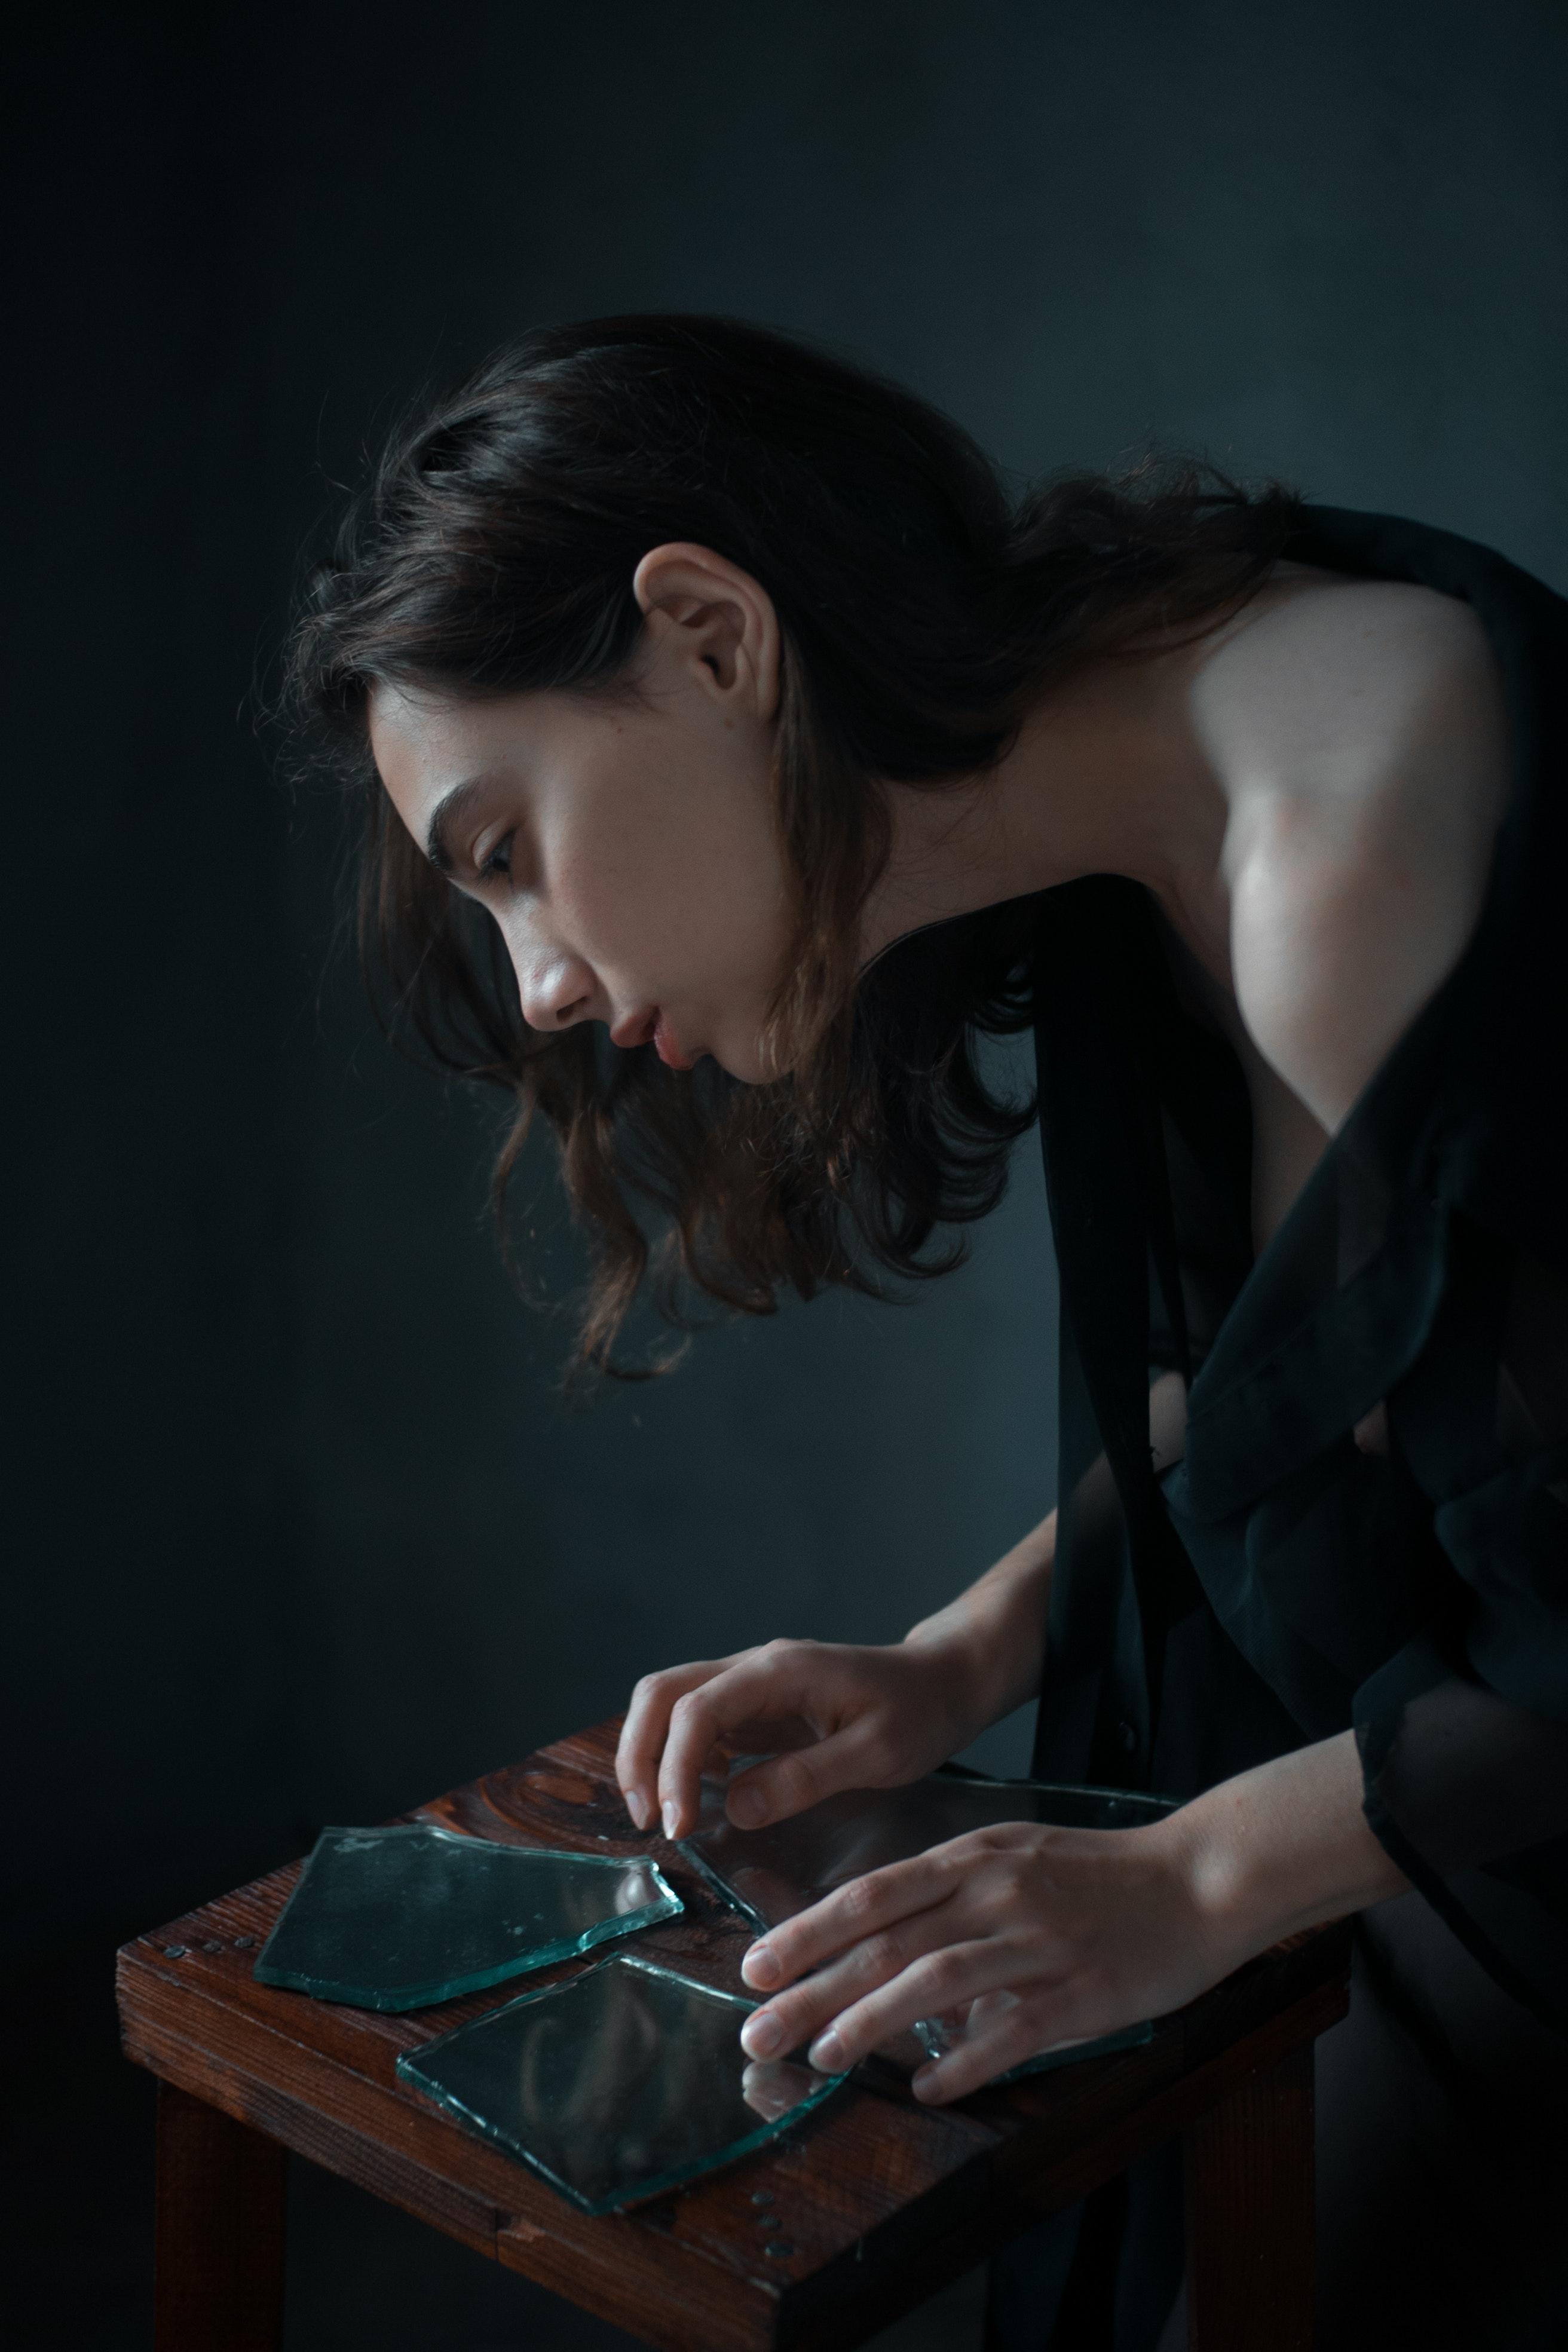 Masha Raymers/Pexels